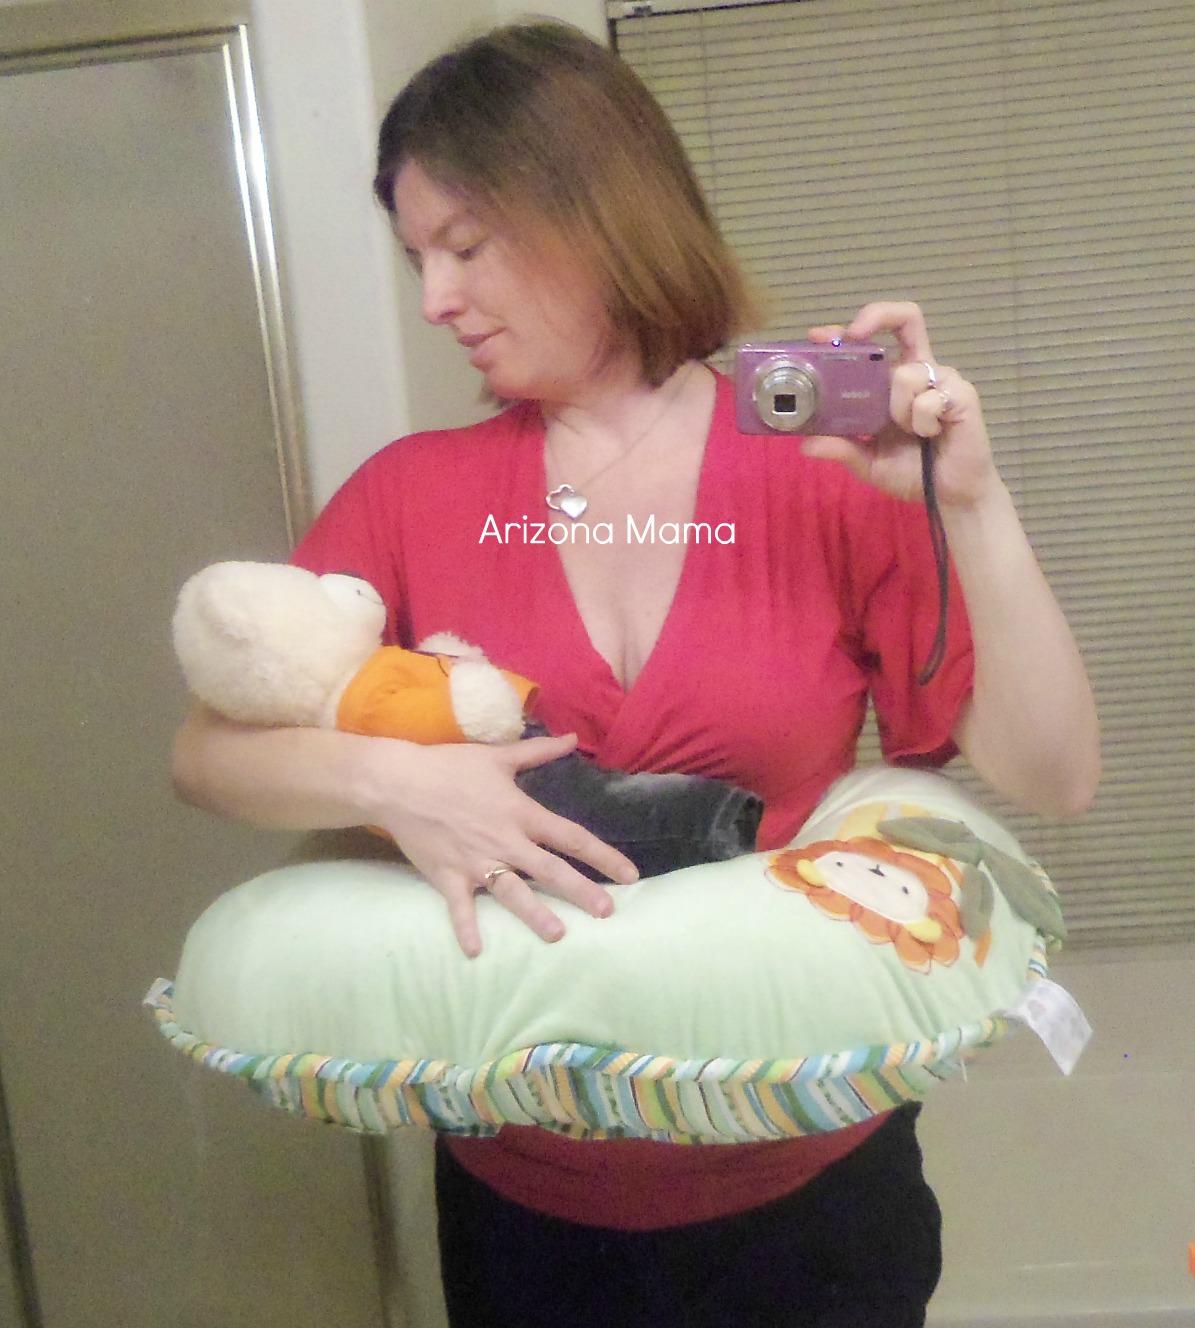 Arizona Mama American Baby Bests Awards Boppy More Then